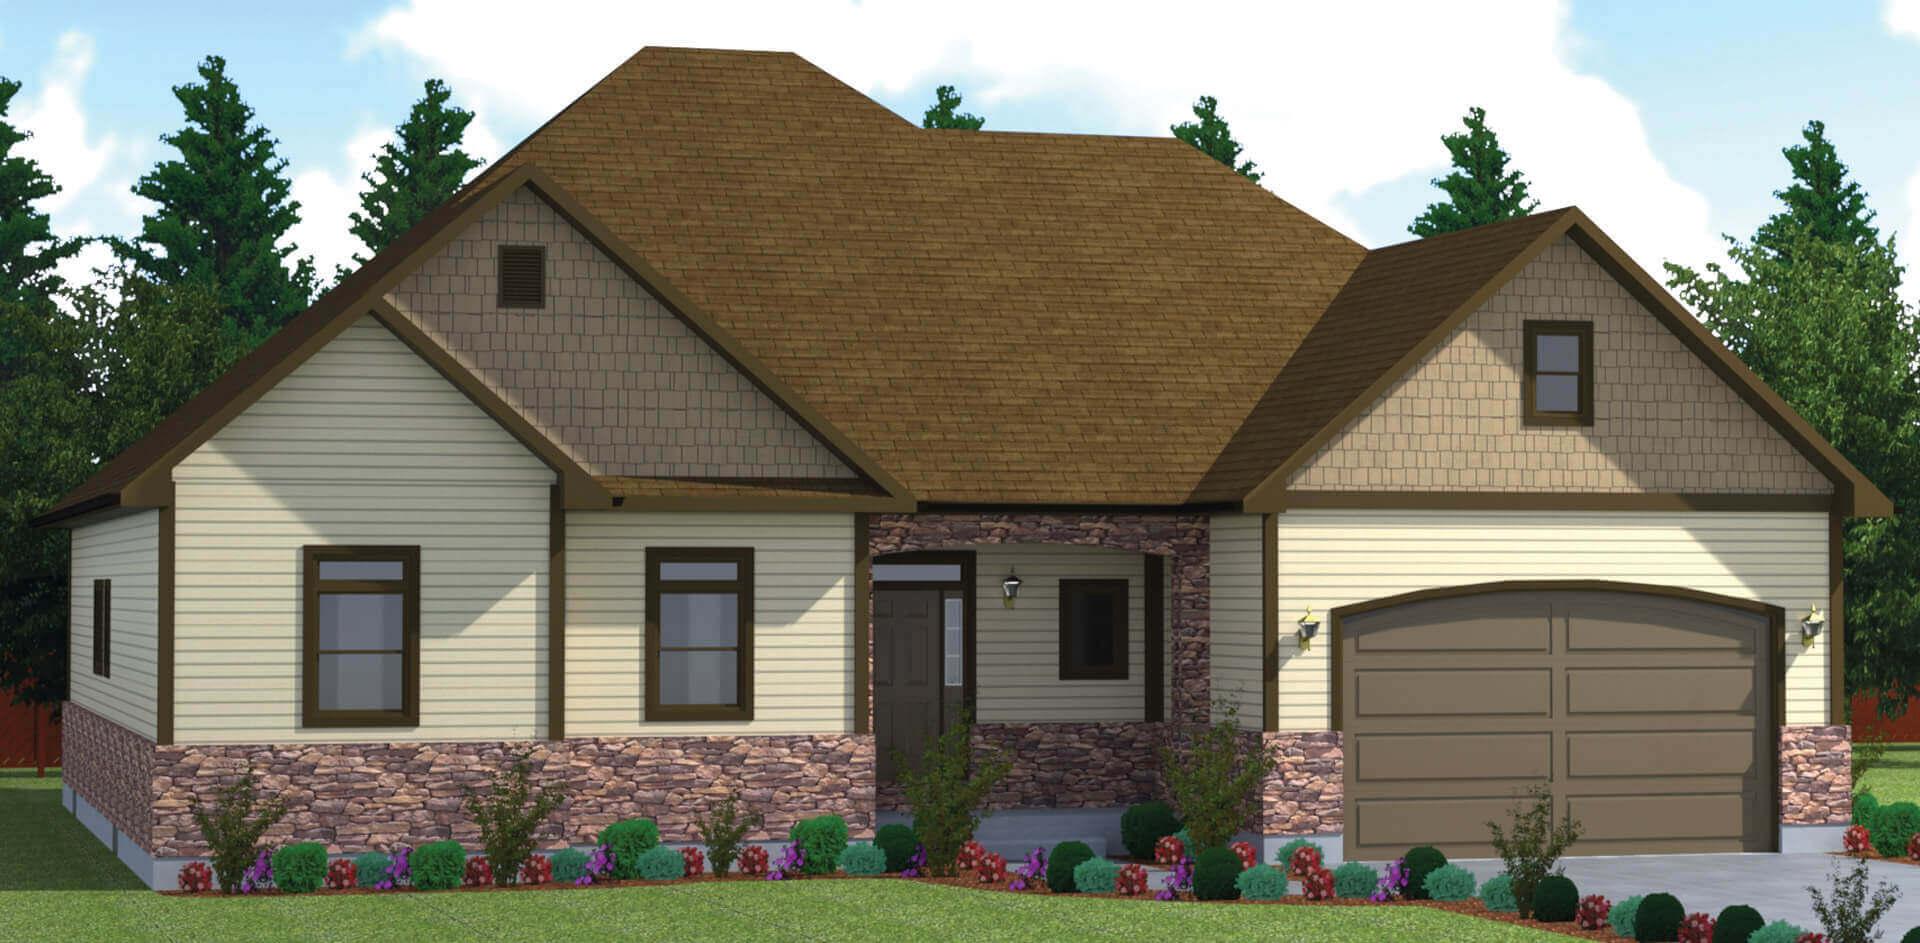 1819 house elevation